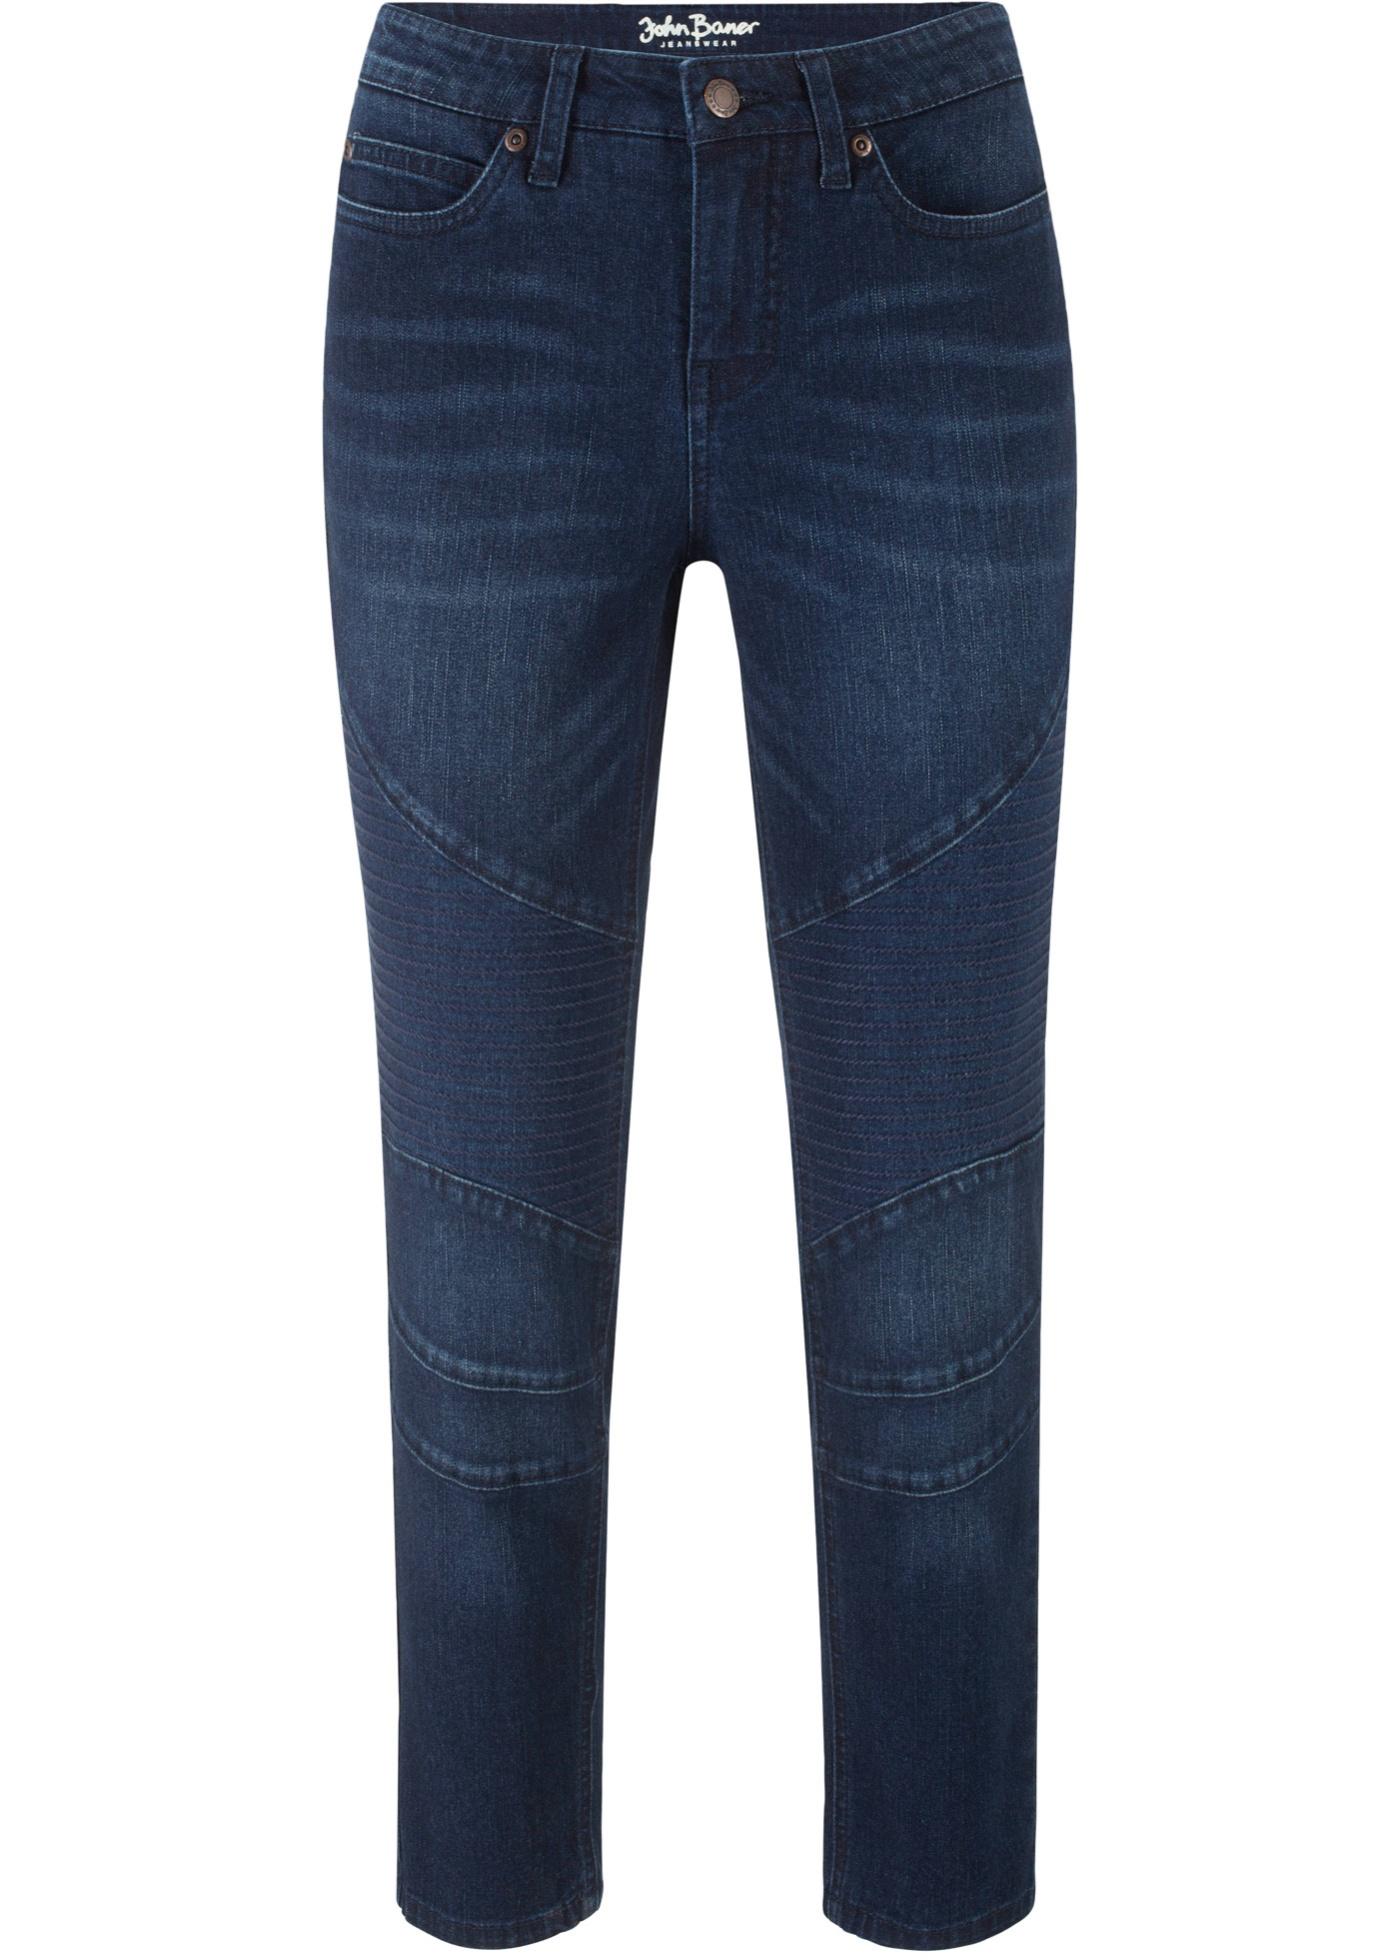 Bonprix - Biker jeans 249.00